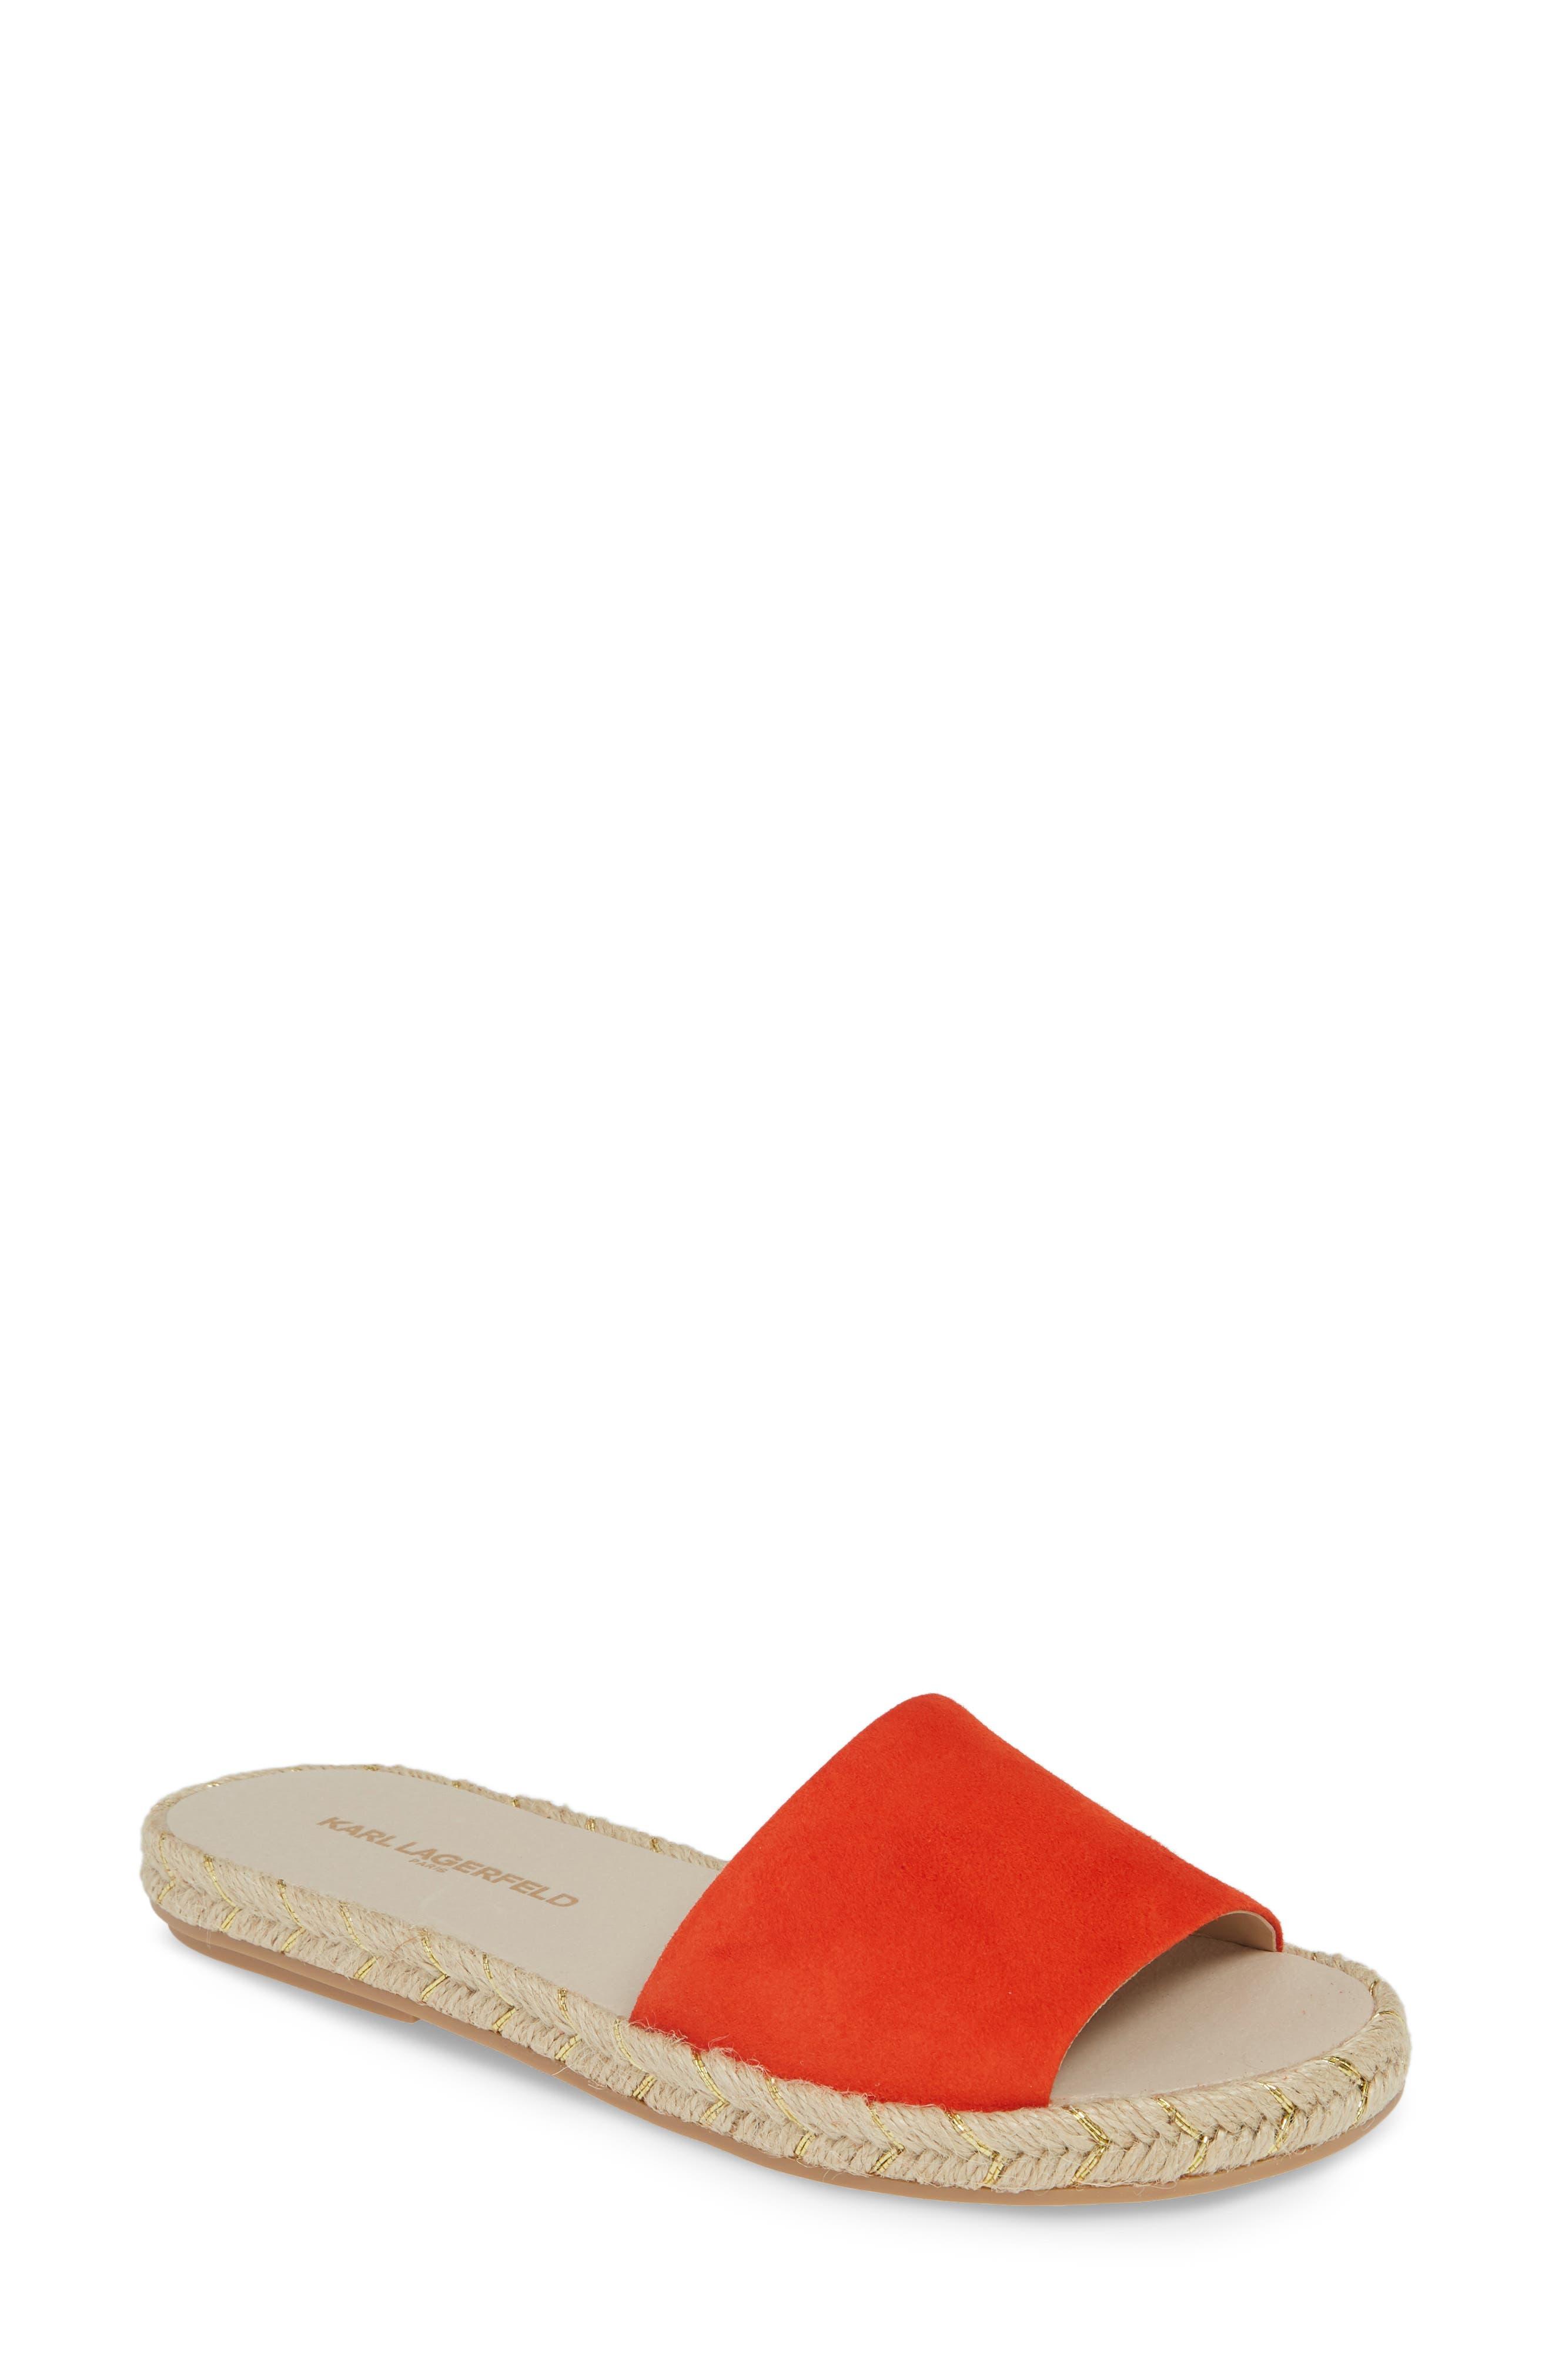 Karl Lagerfeld Paris Niya Slide Sandal- Orange